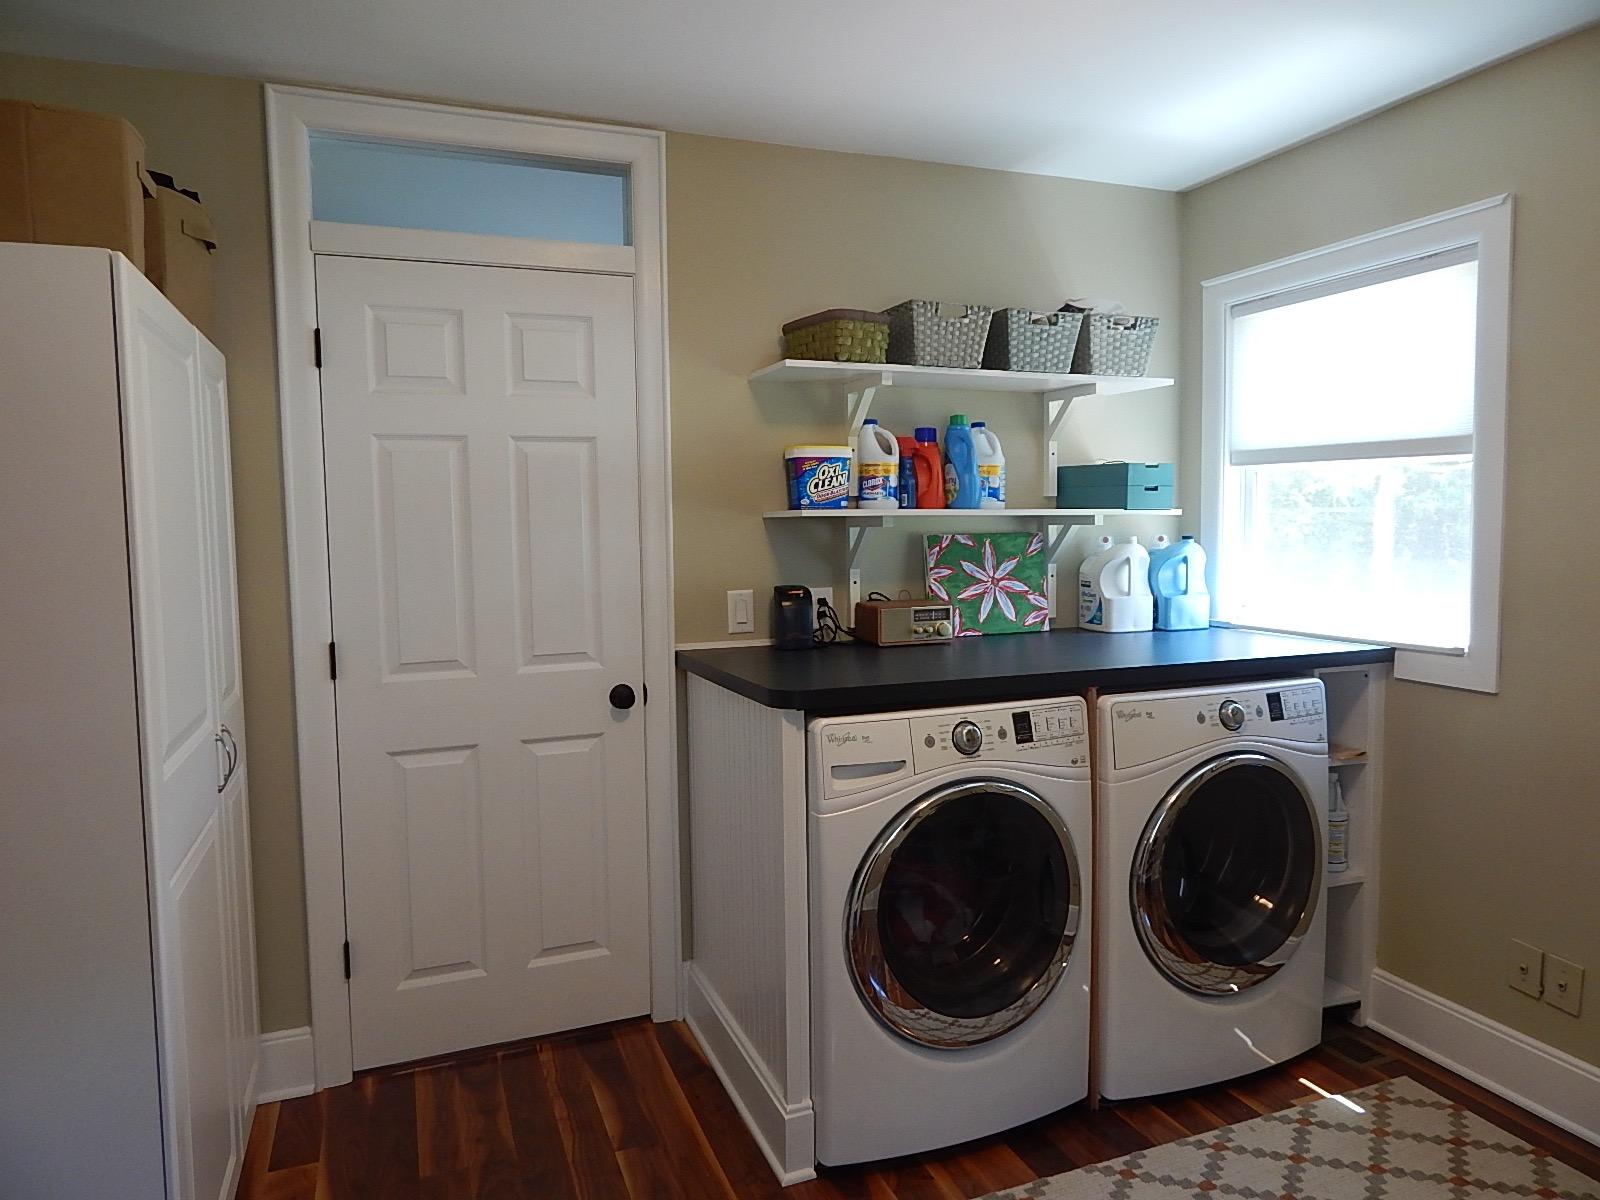 1339 Bishop Rd Saline, MI Laundry room